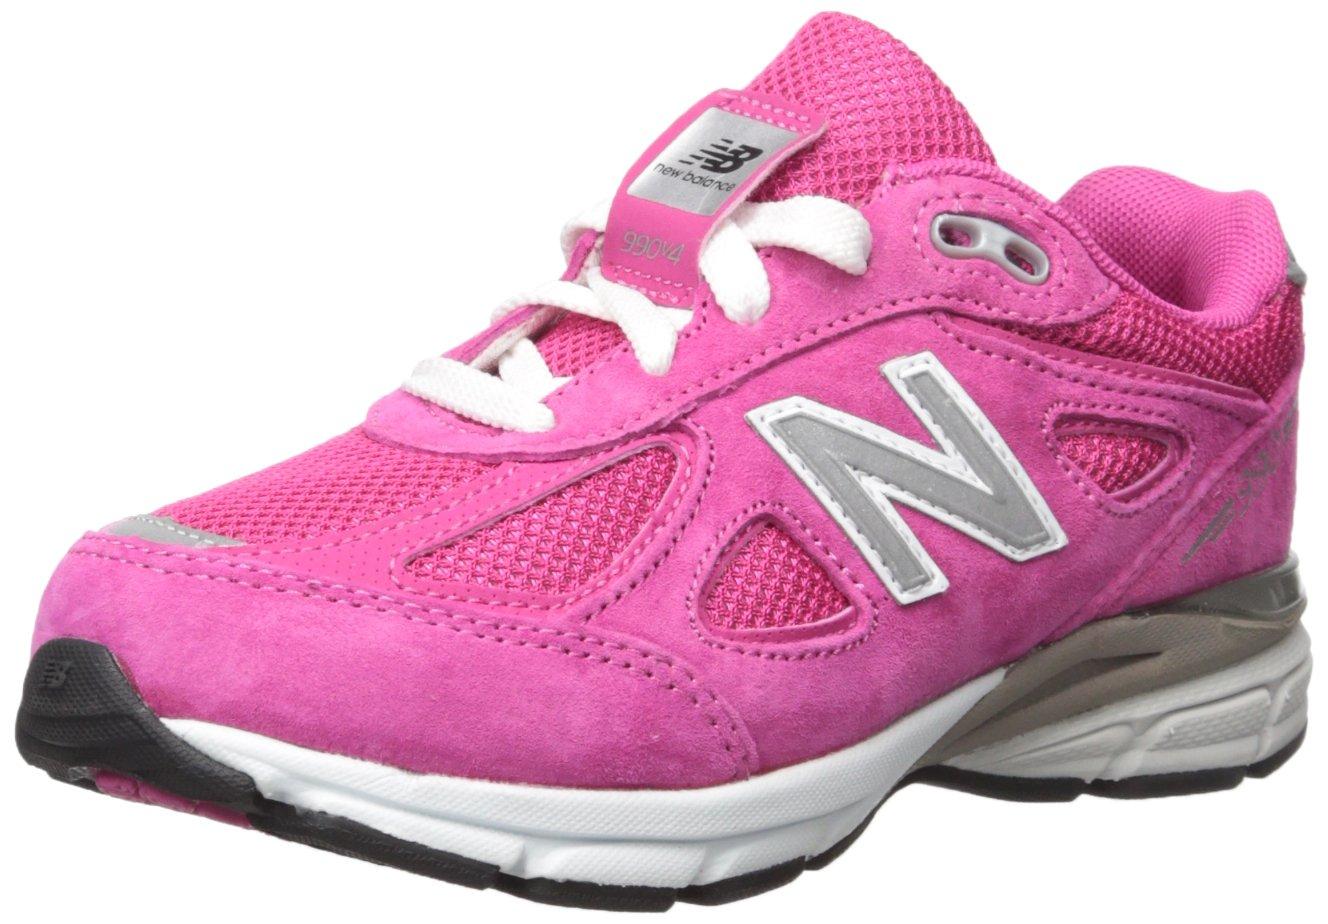 New Balance KJ990V4 Running Shoe , Pink/Pink, 1 M US Little Kid by New Balance (Image #1)